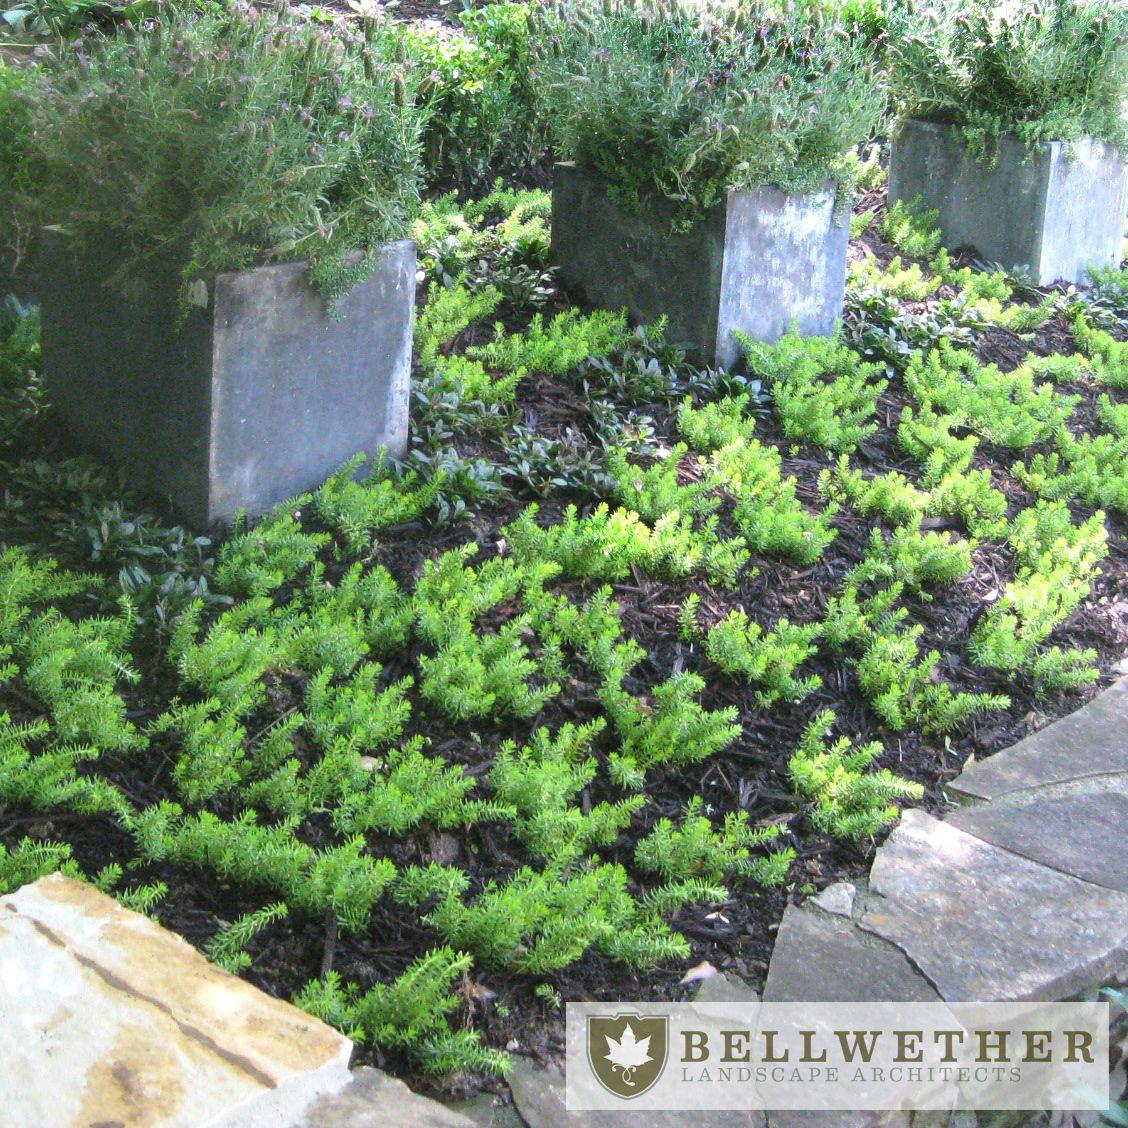 Landscape architect atlanta ga - Bellwether Landscape Architects Located In Atlanta Ga